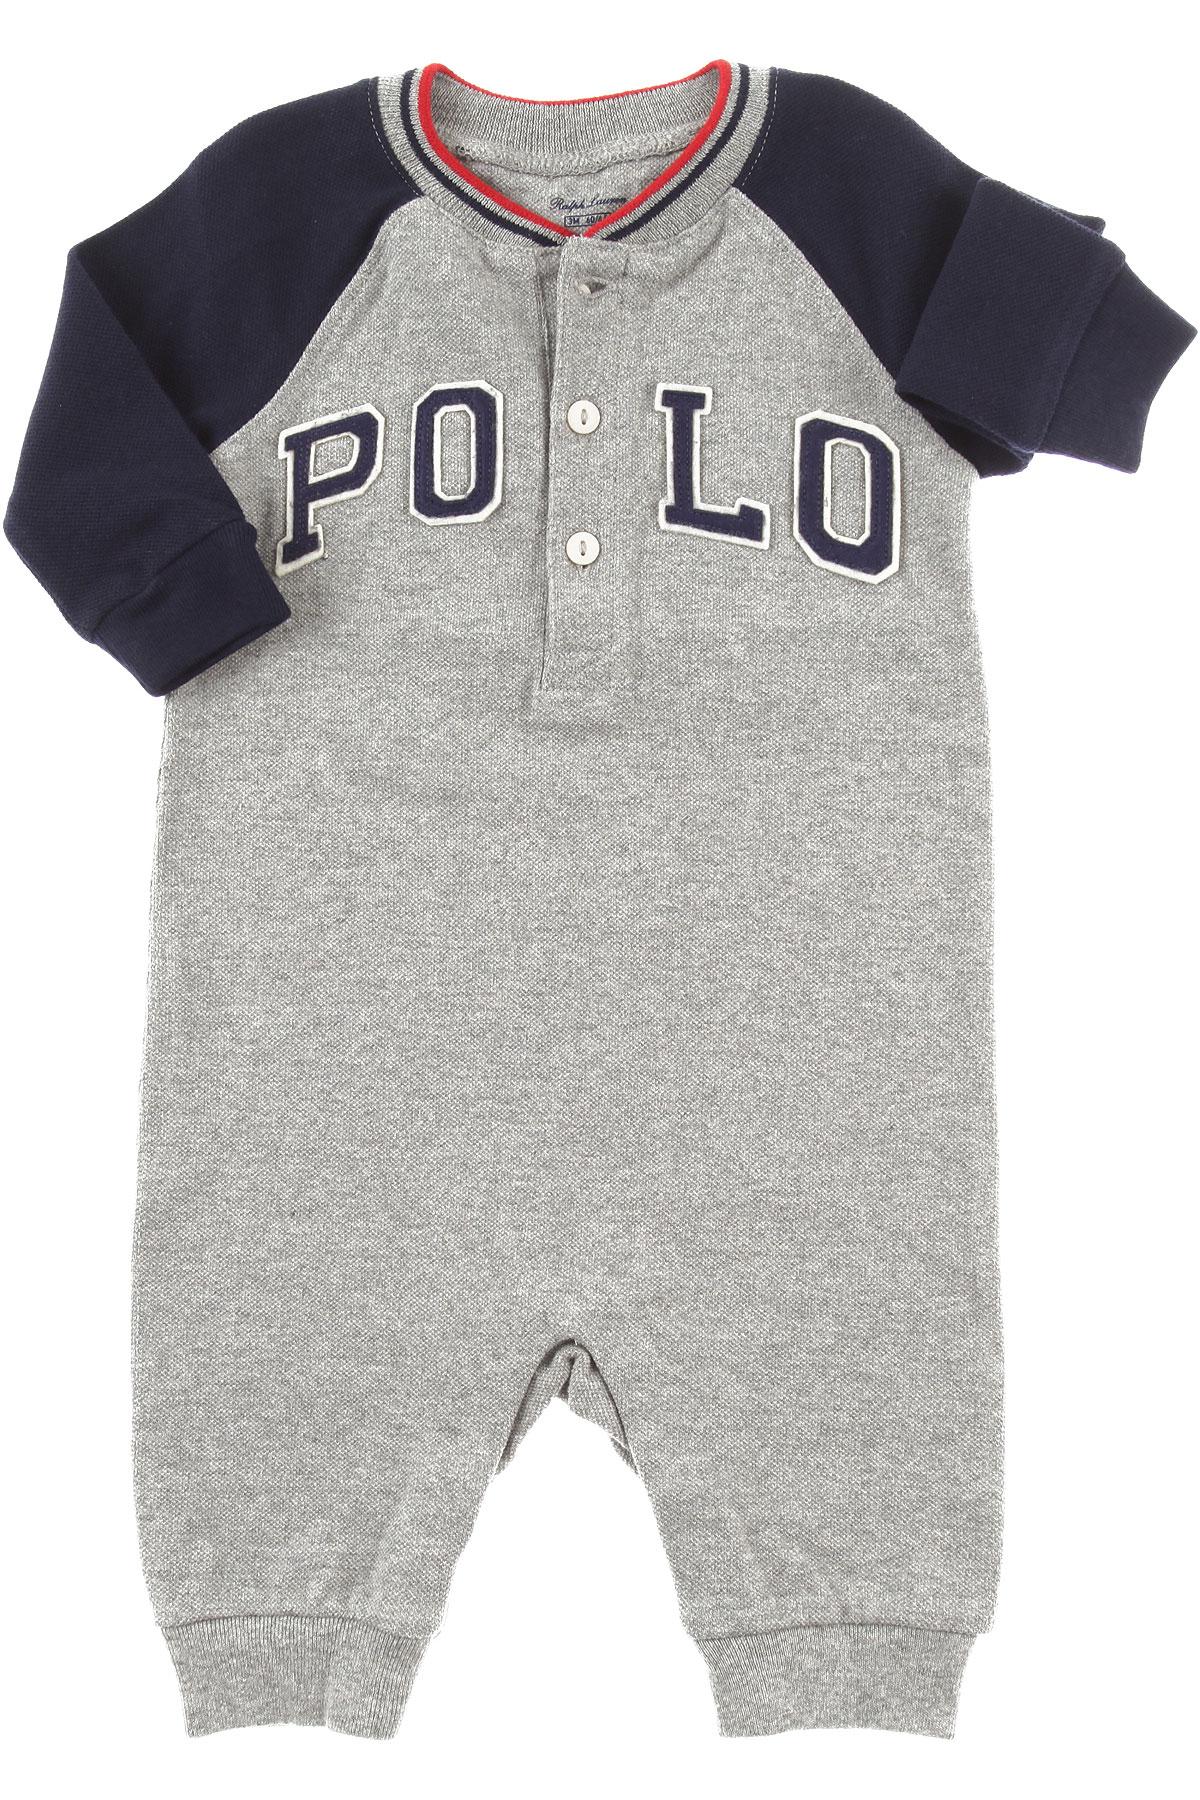 Image of Ralph Lauren Baby Bodysuits & Onesies for Boys, Grey, Cotton, 2017, 3M 6M 9M